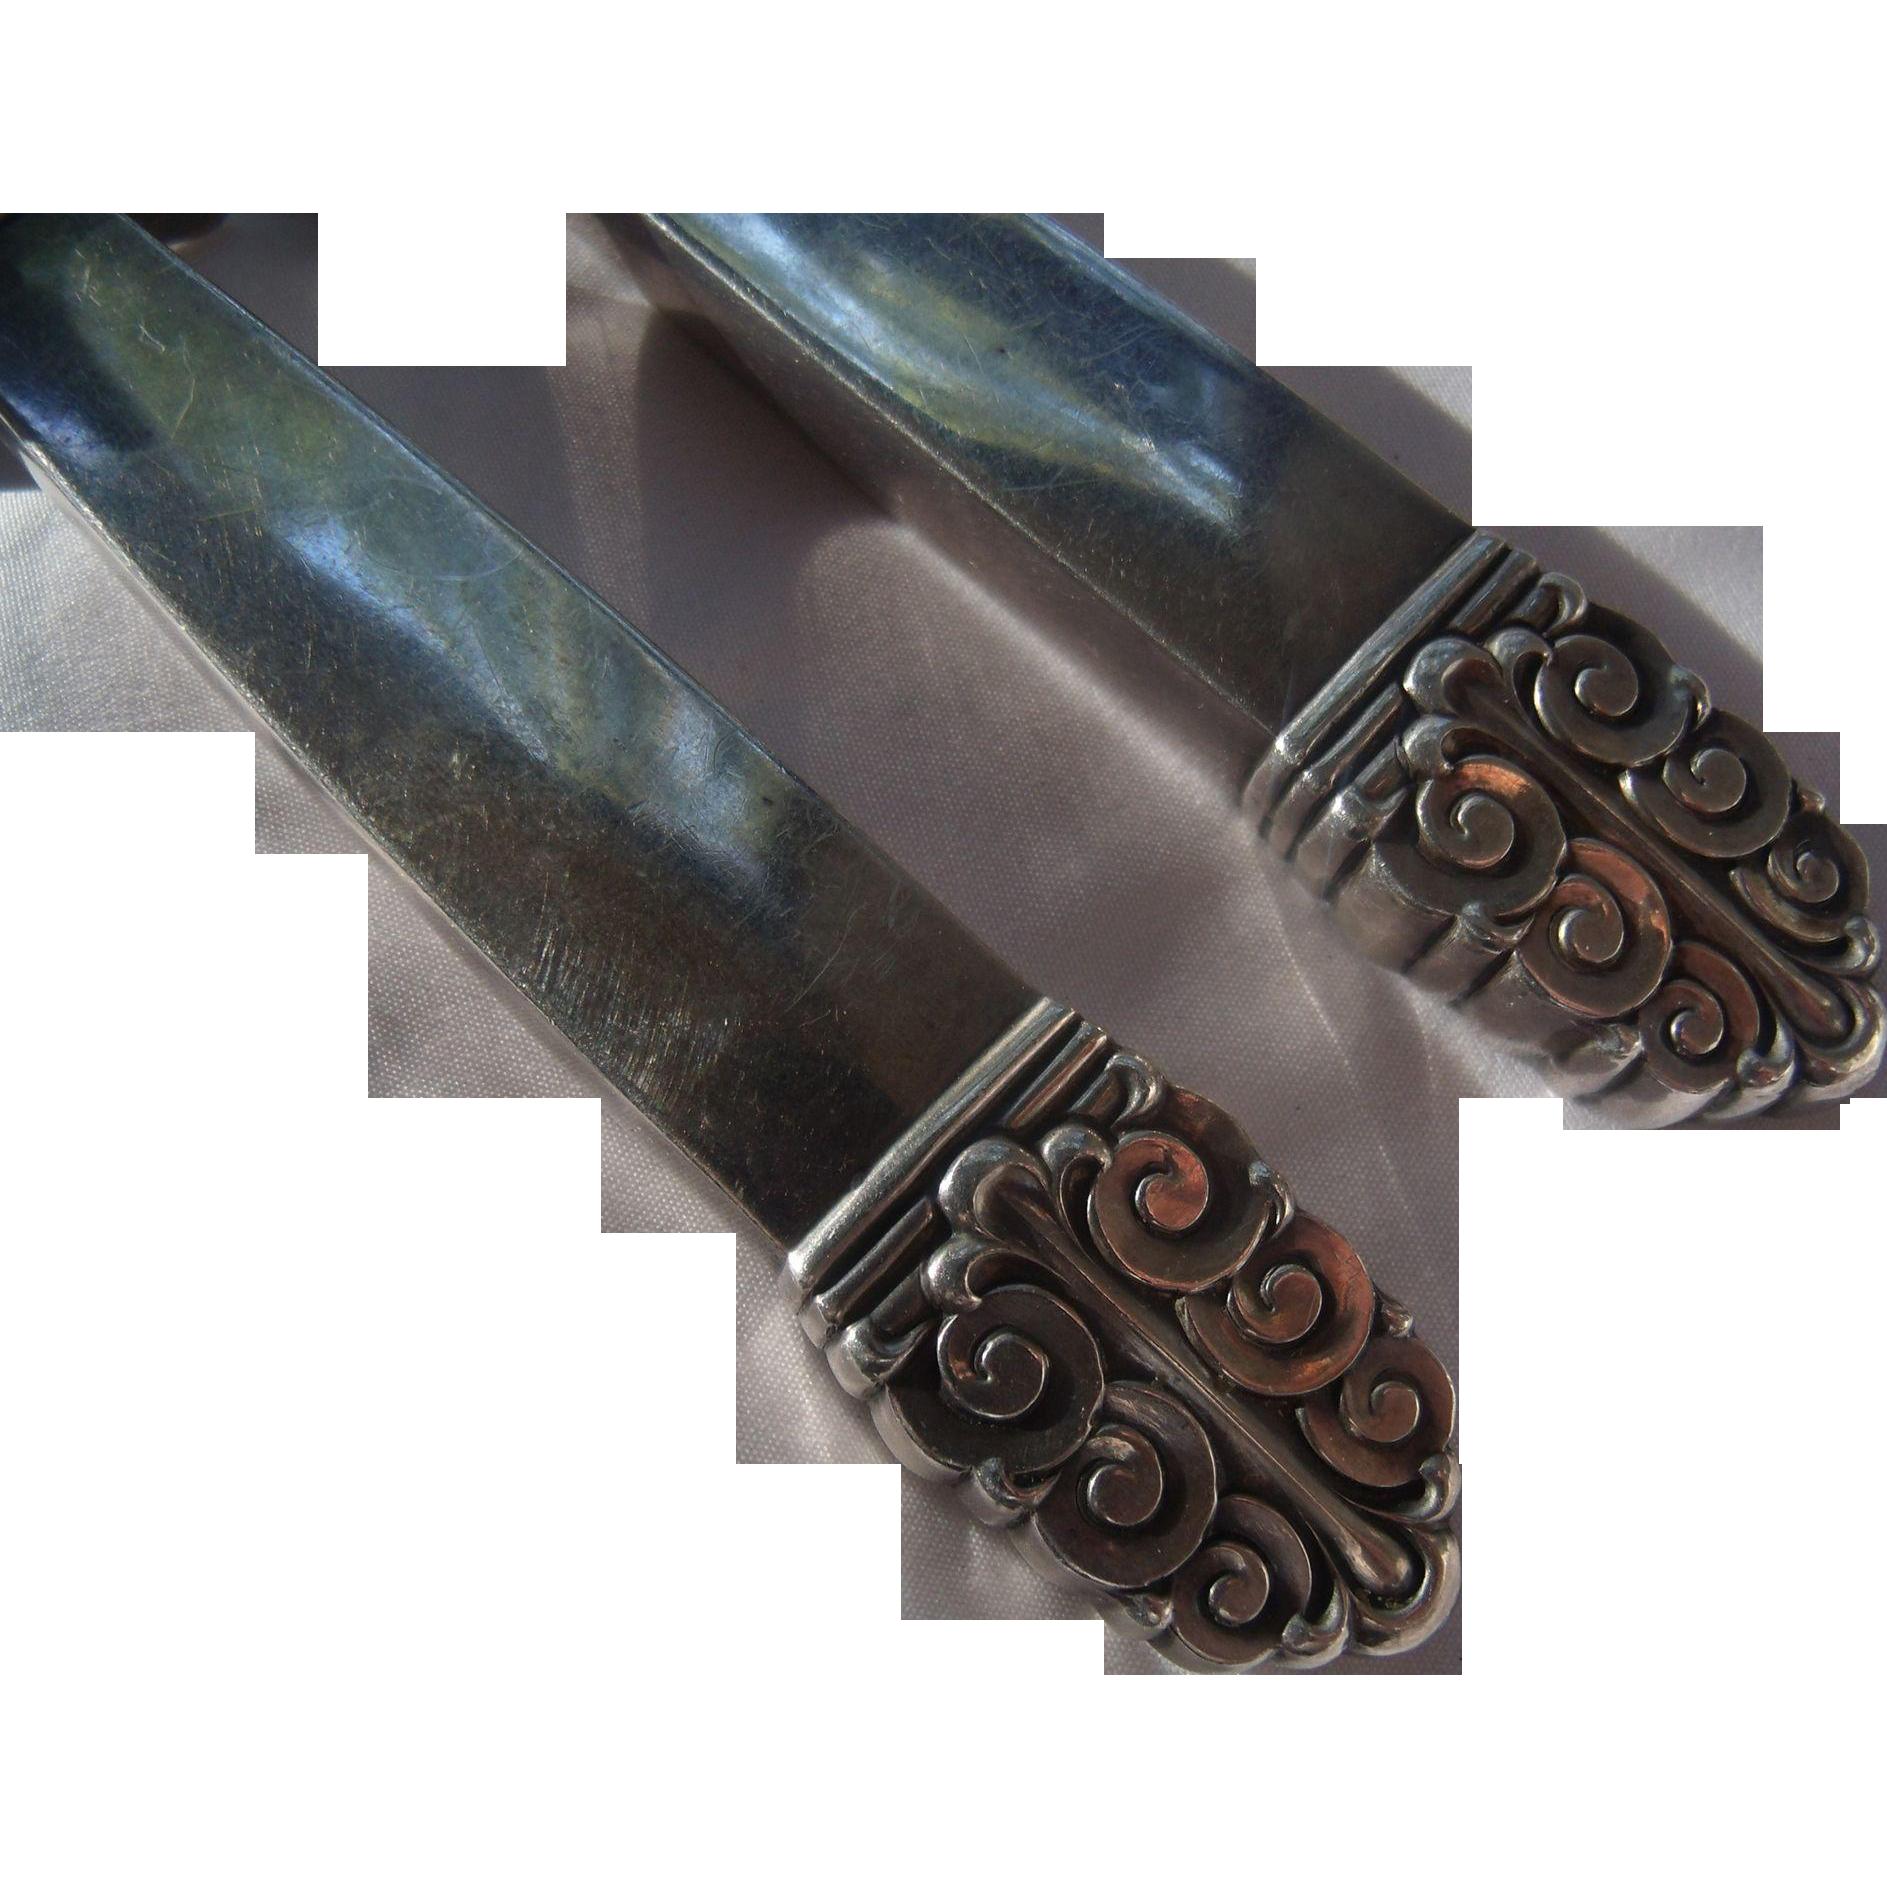 Handsome Sterling Carving Cutlery Set